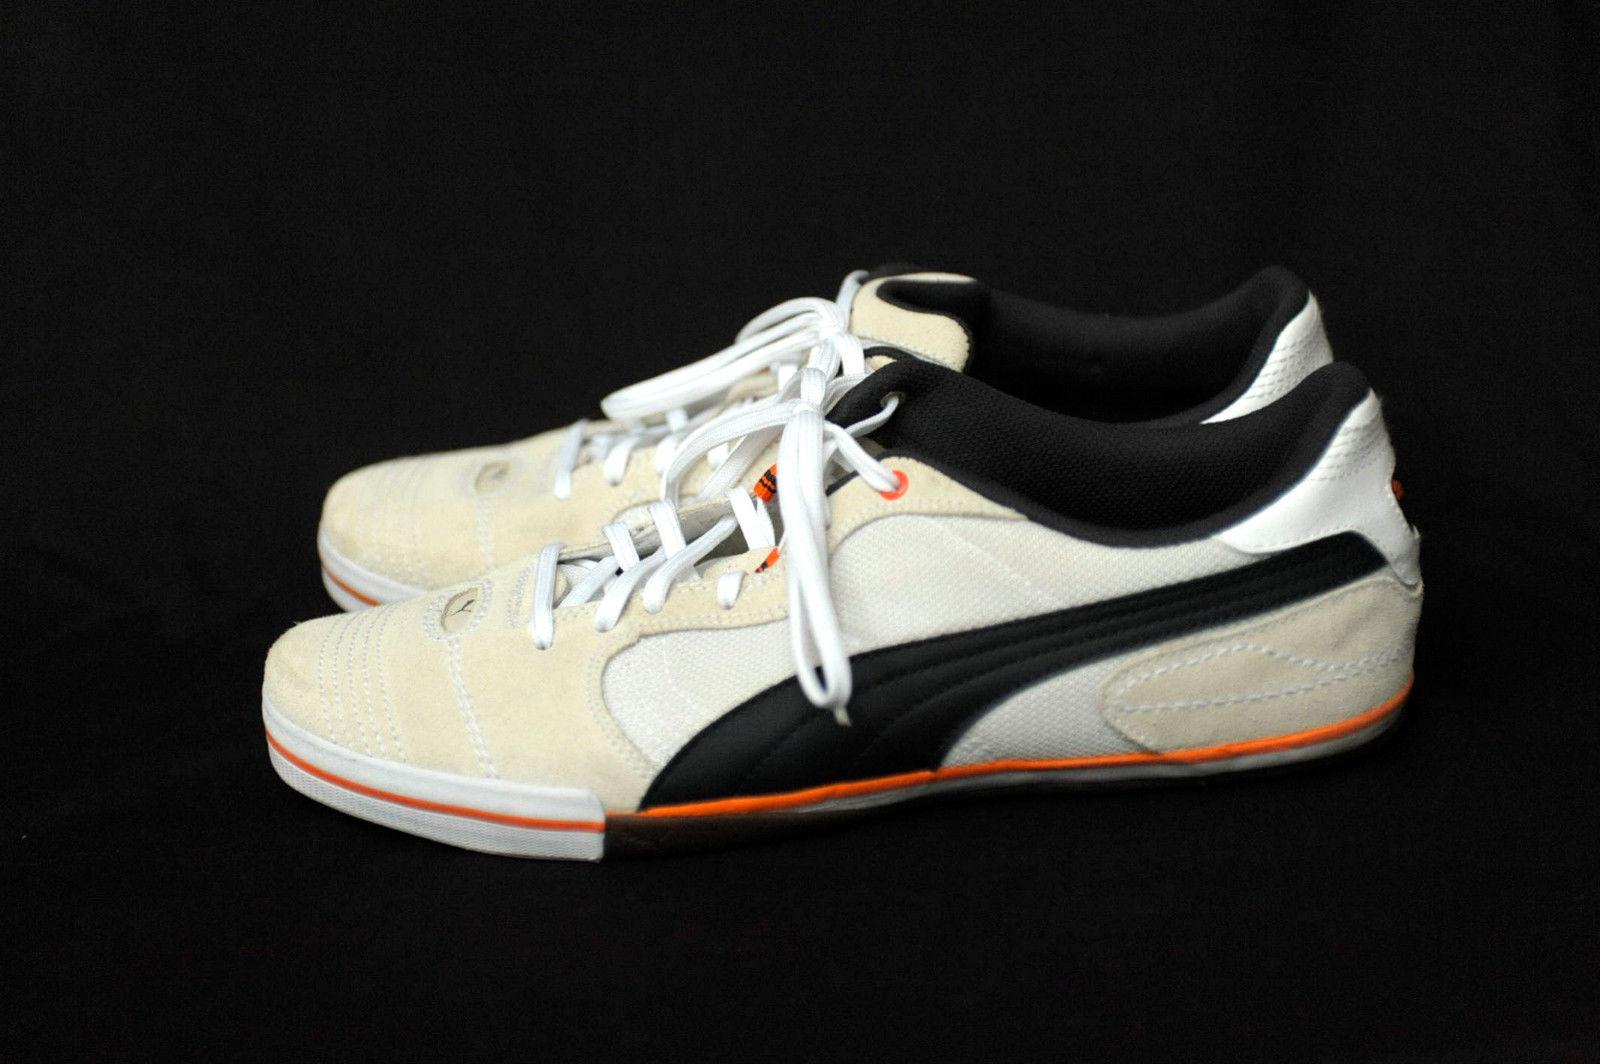 6533347c61d510 Puma Leather Textile Sneakers US Men s 11 White Beige Blue  Worn Once